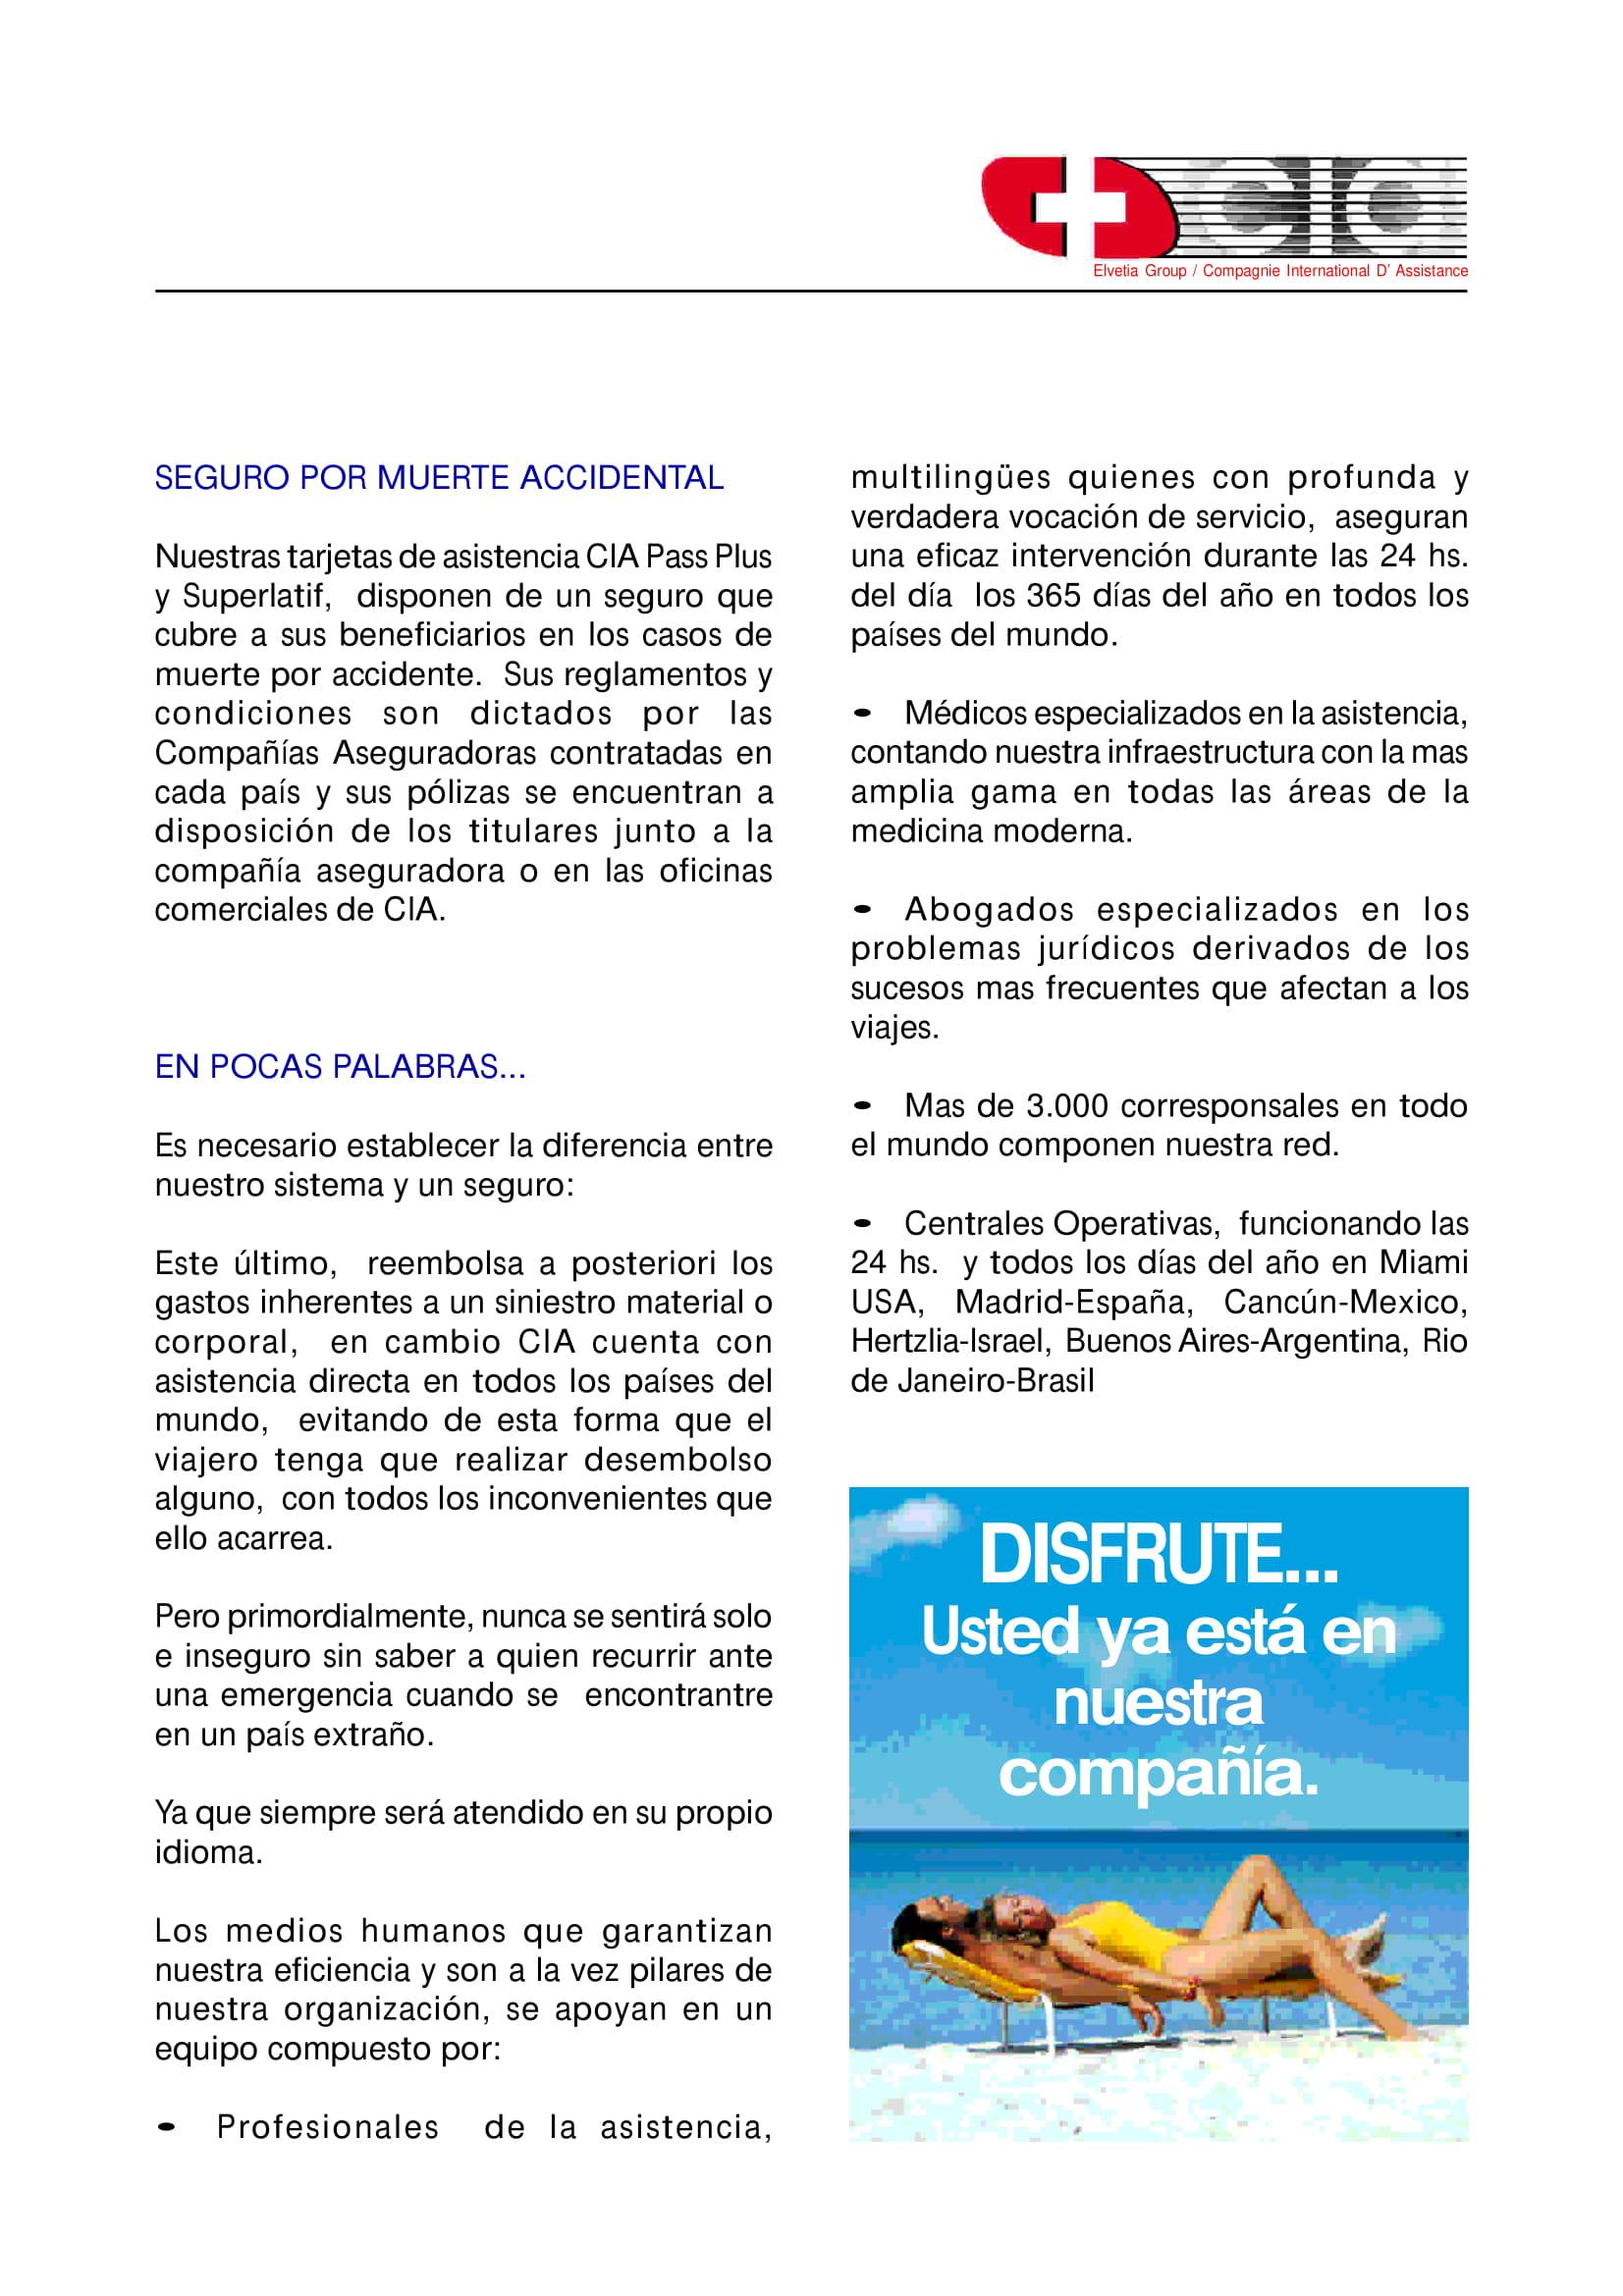 Company profile esp.-5